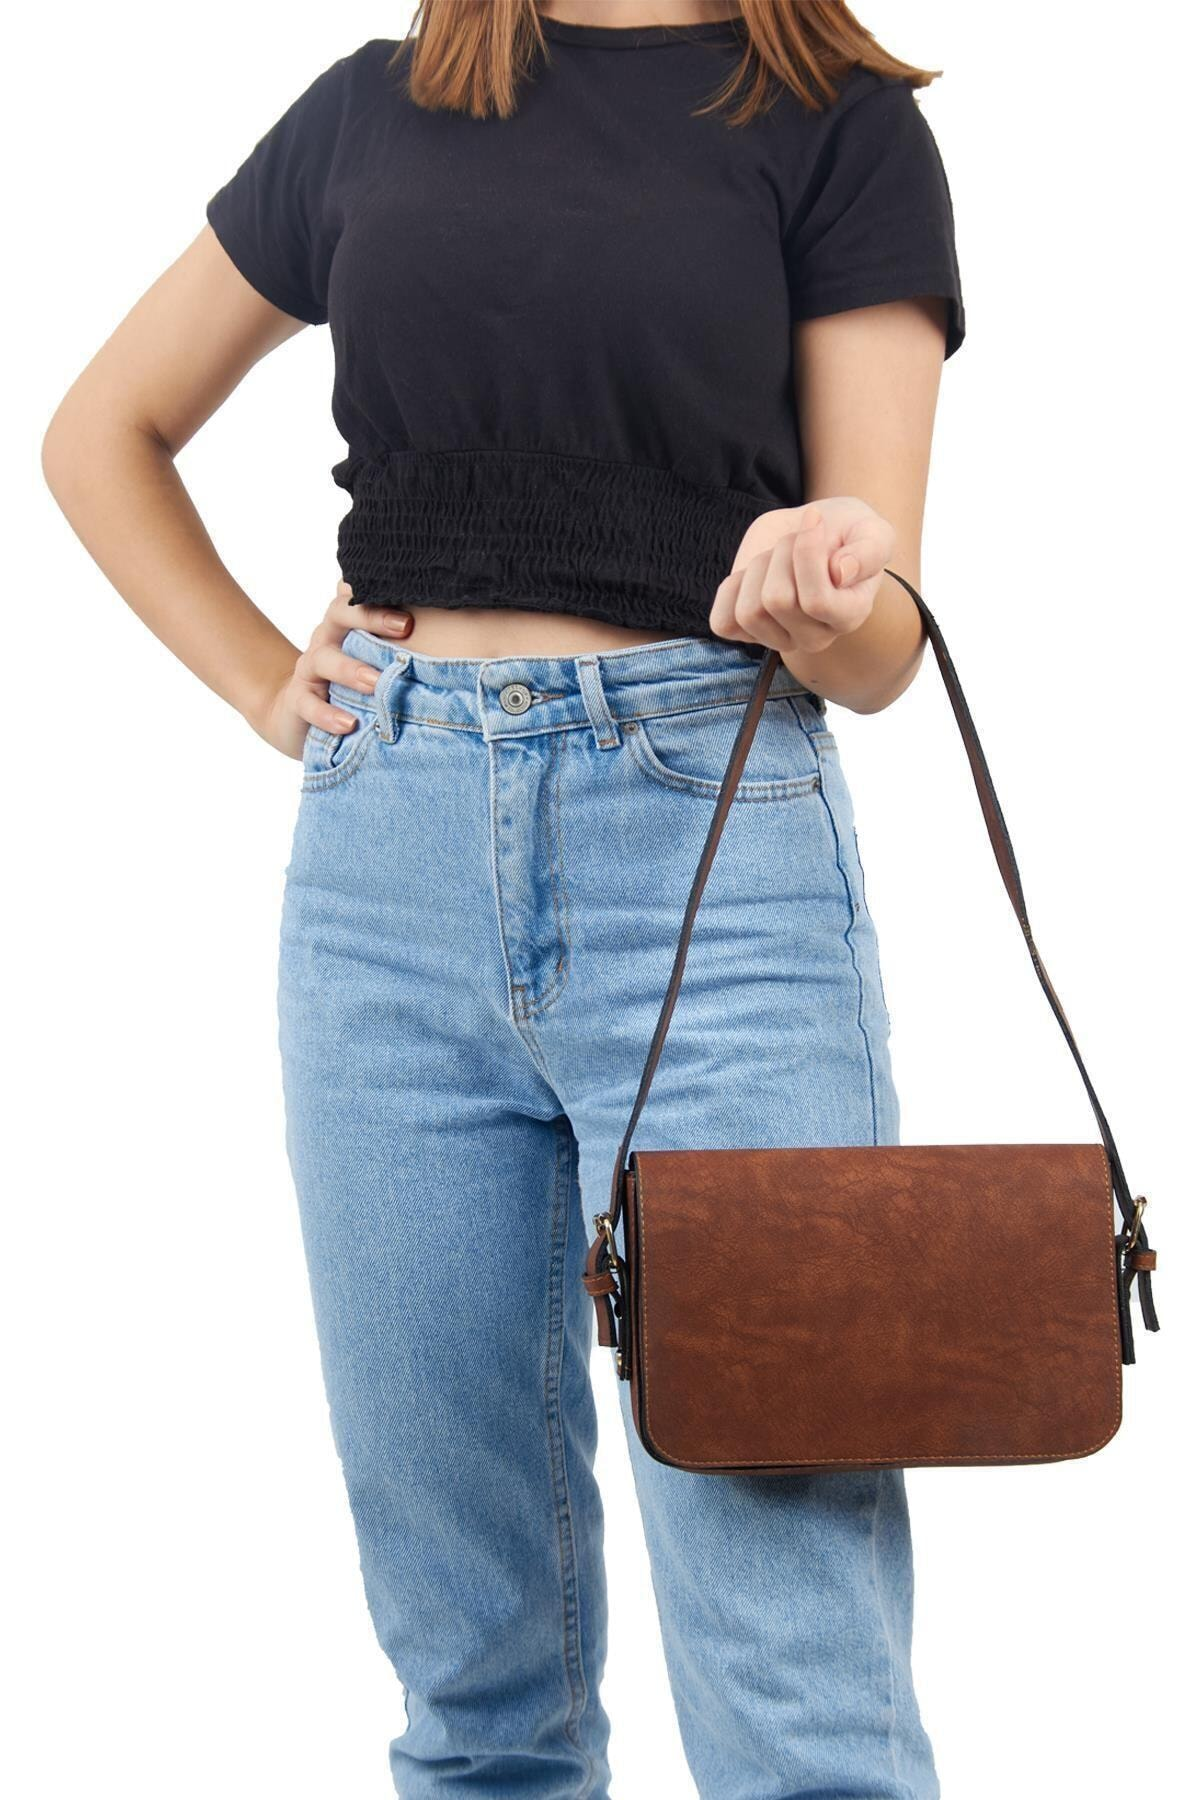 Lebina Kahverengi Kapaklı Baget Çanta 1